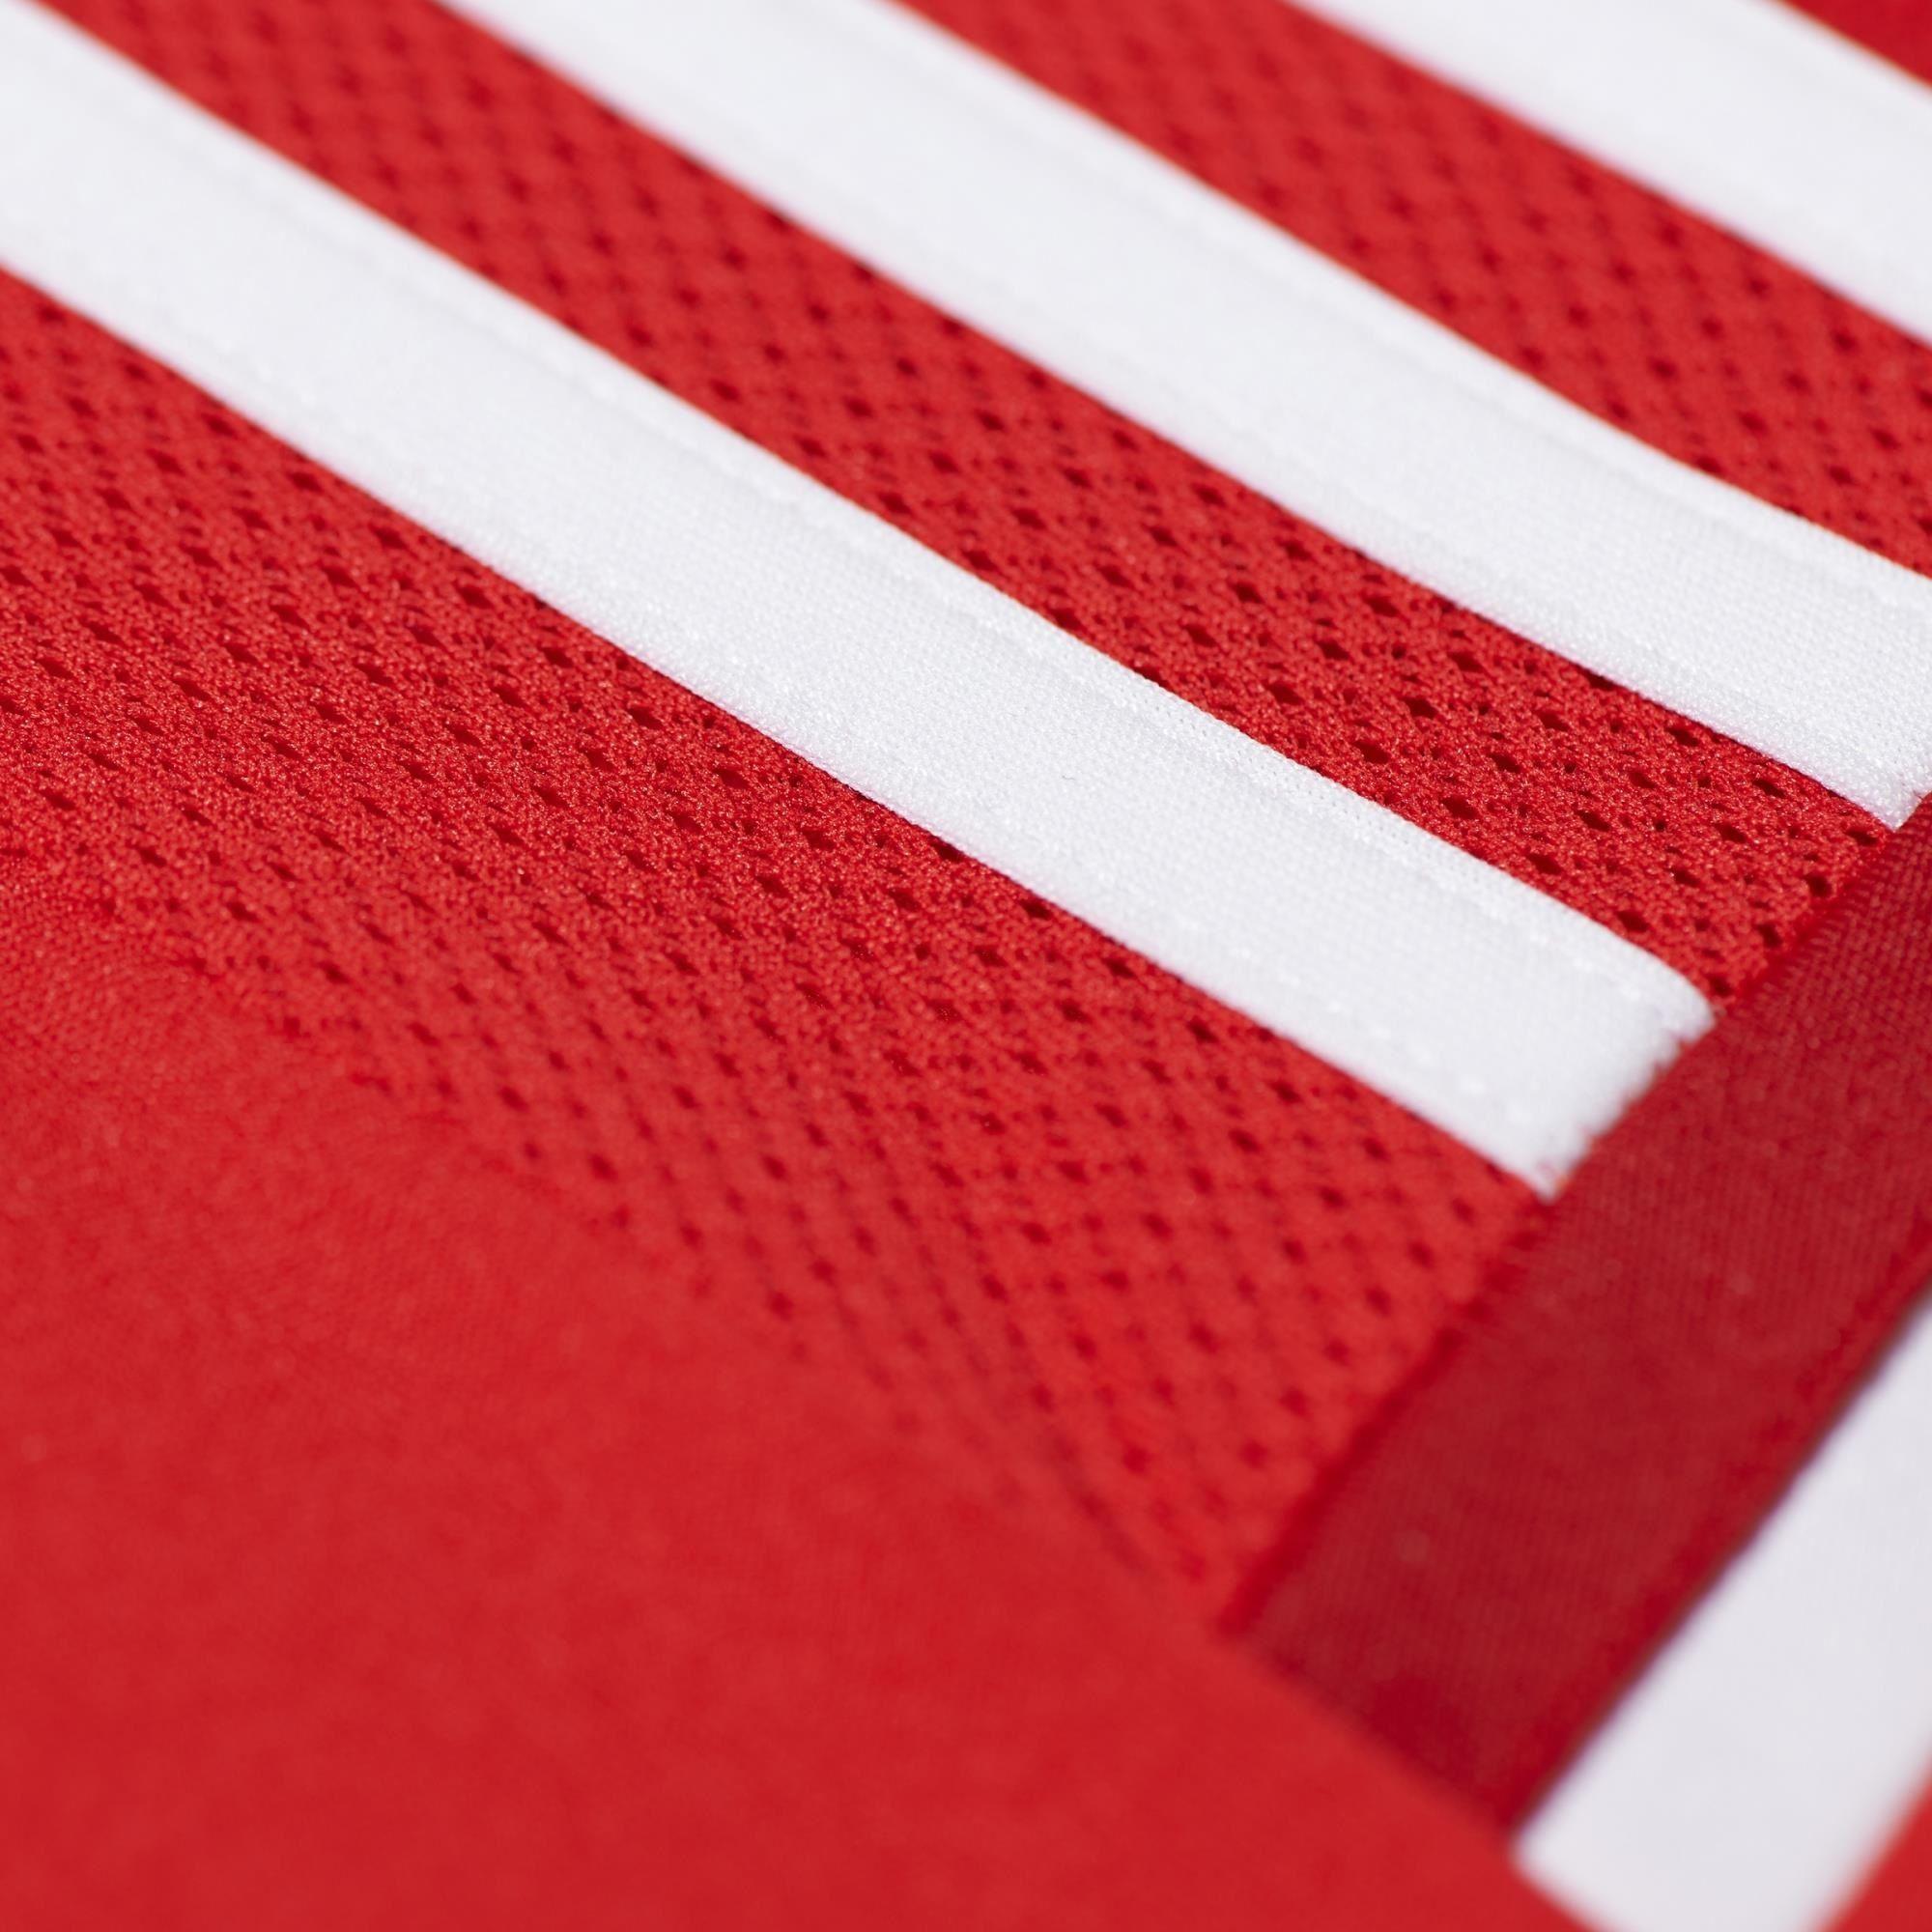 Football com category football kits image sl benfica 1st kit - Http Www Footballshirtculture Com 14 15 Kits Benfica 2014 2015 Adidas Home Football Shirt Html Sigproid27c2726e36